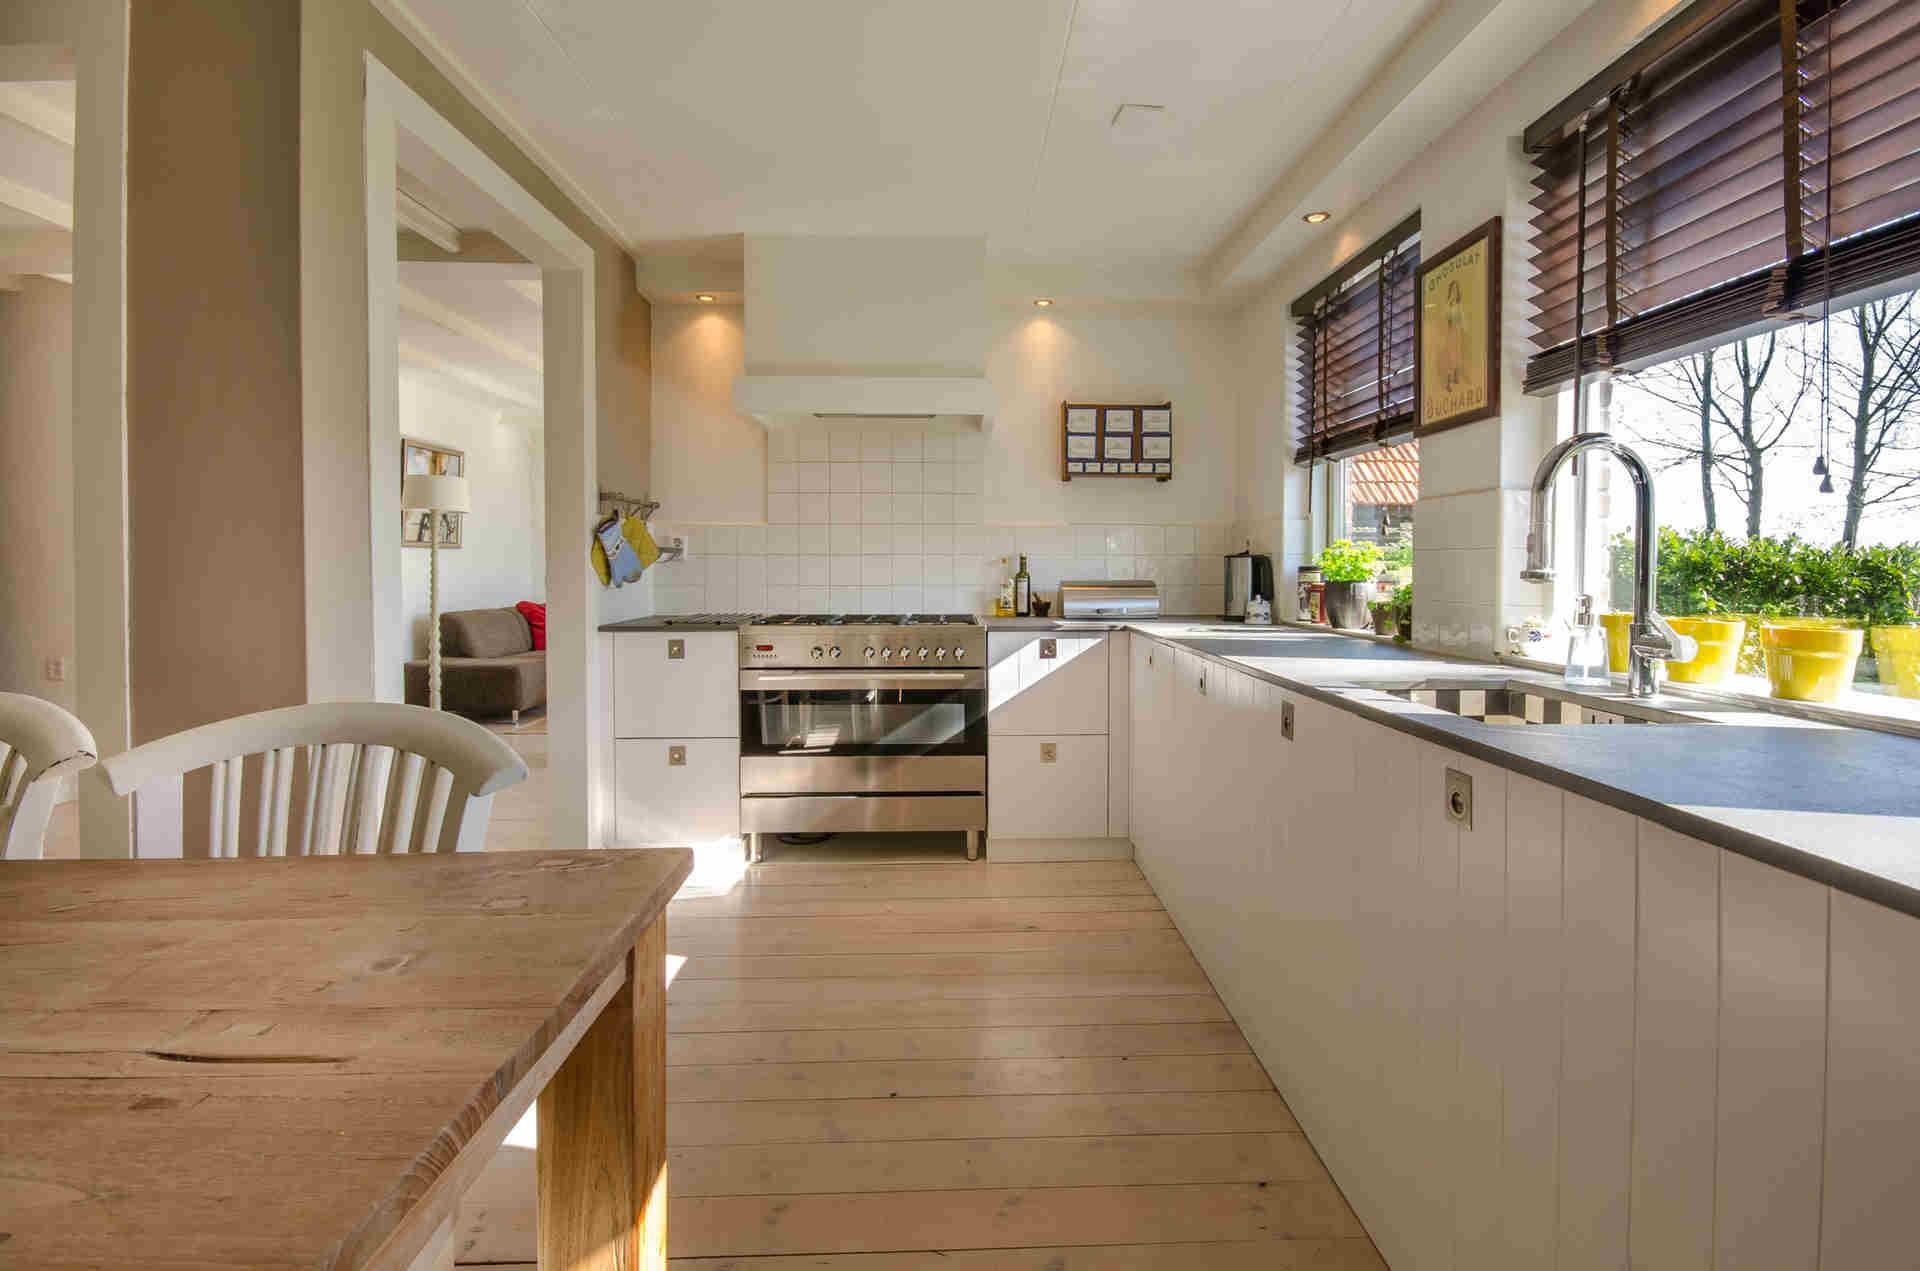 kitchen-stove-sink-kitchen-counter.jpeg